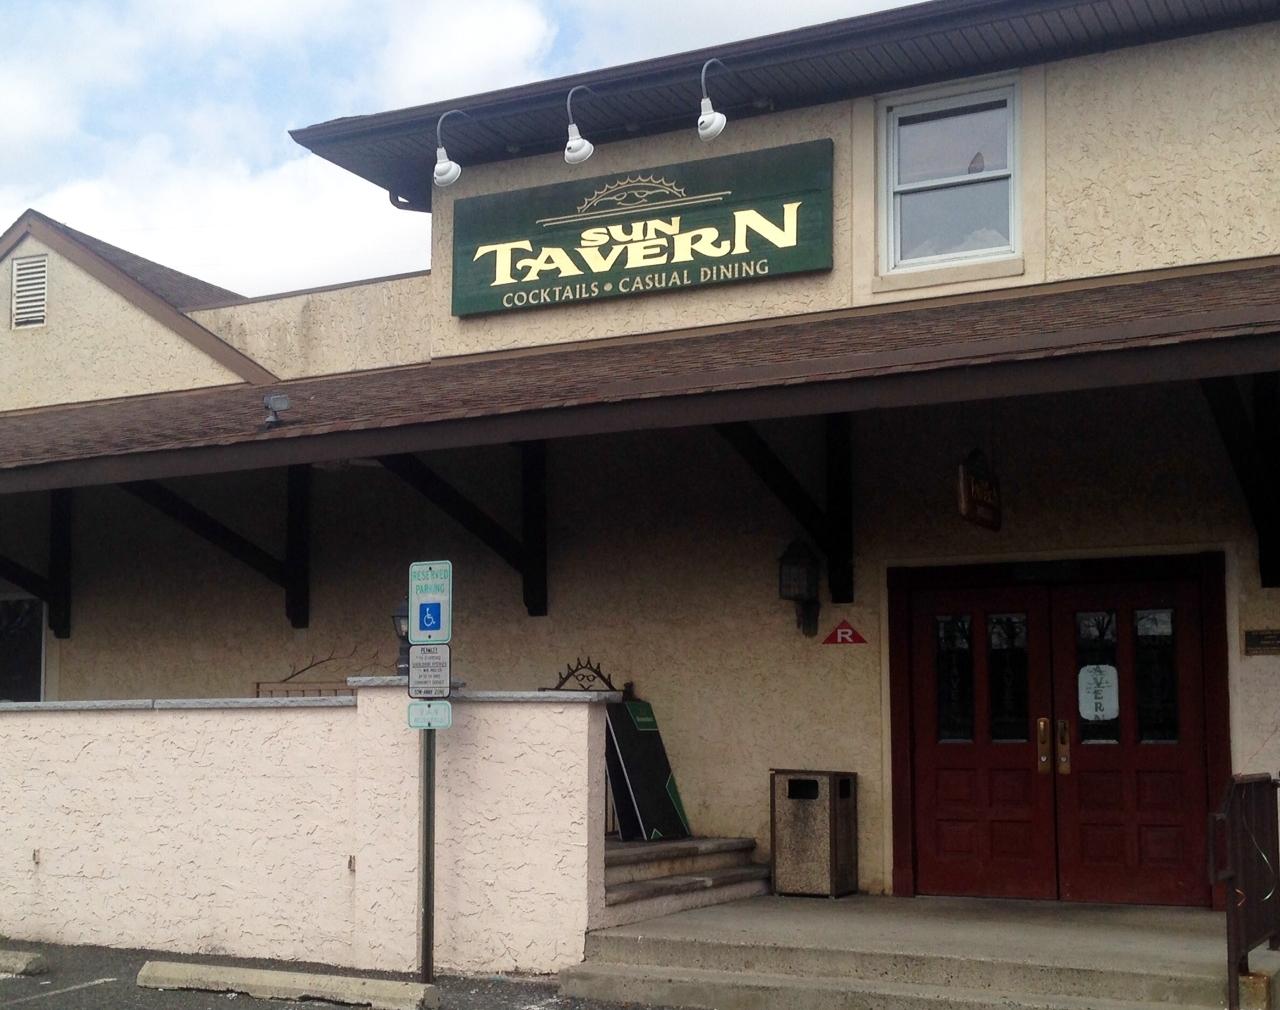 536344e3a55cbe28c630_Sun_Tavern_outside.jpeg